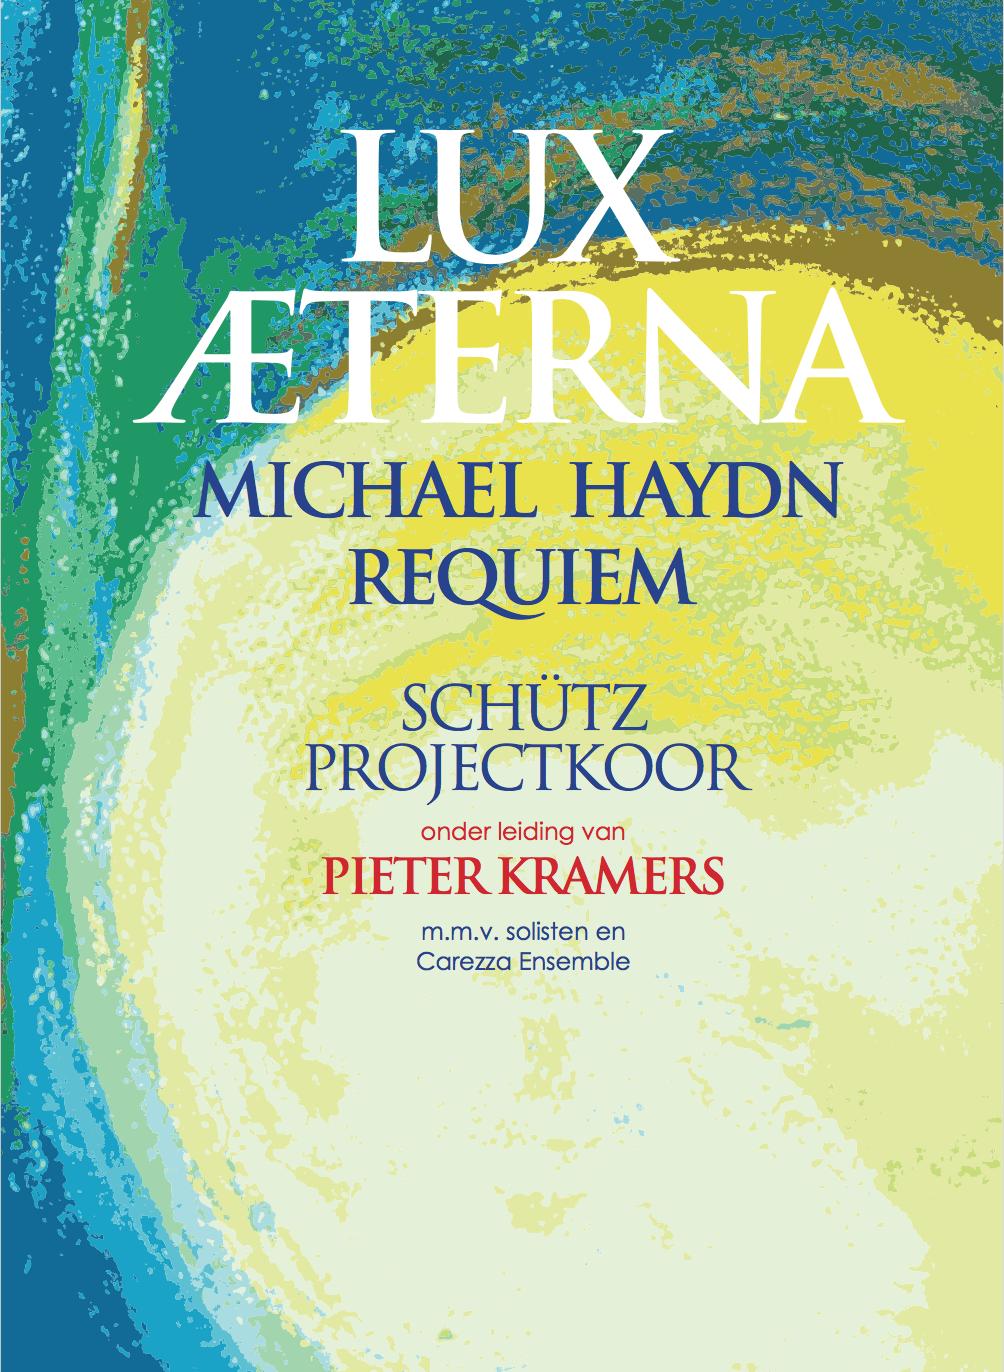 omslag van programmaboekje 'Lux Æterna'